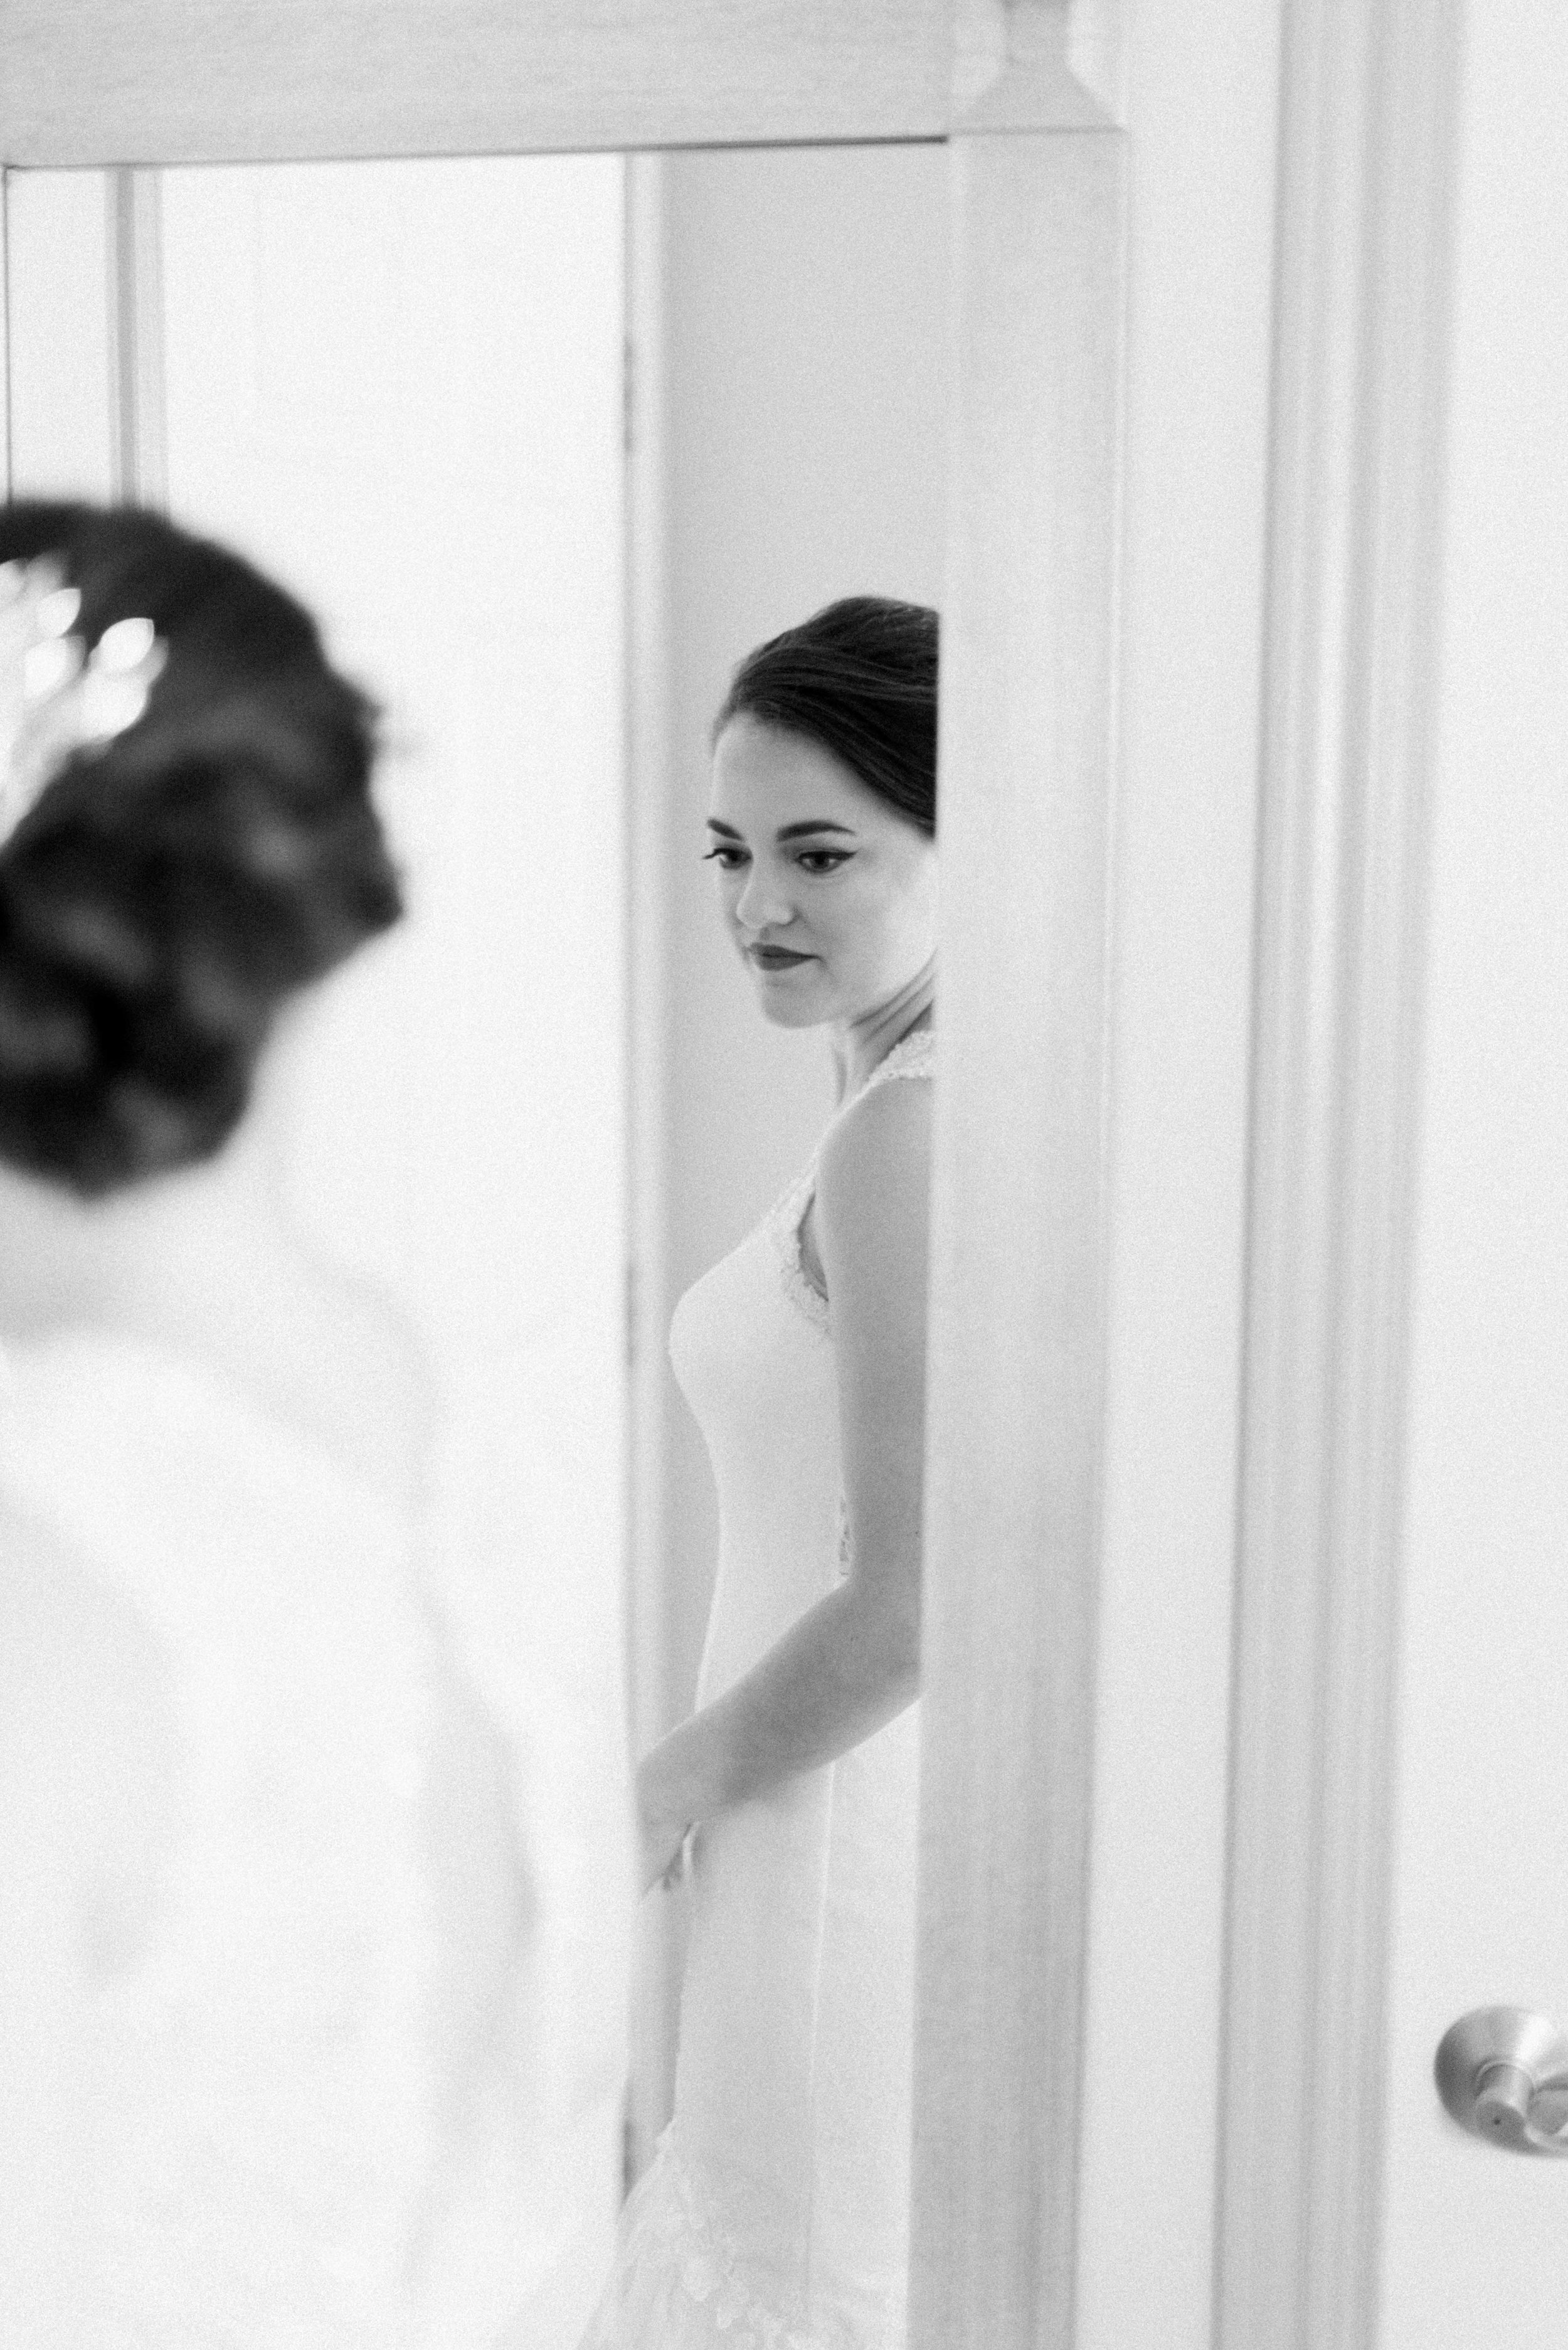 The-Knot-Texas-Fine-Art-Wedding-Film-Destination-Photographer-Houston-Austin-Dallas-New-Orleans-Julia-Ideson-Library-Event-Dana-Josh-Fernandez-Photograph-Top-Best-51.jpg